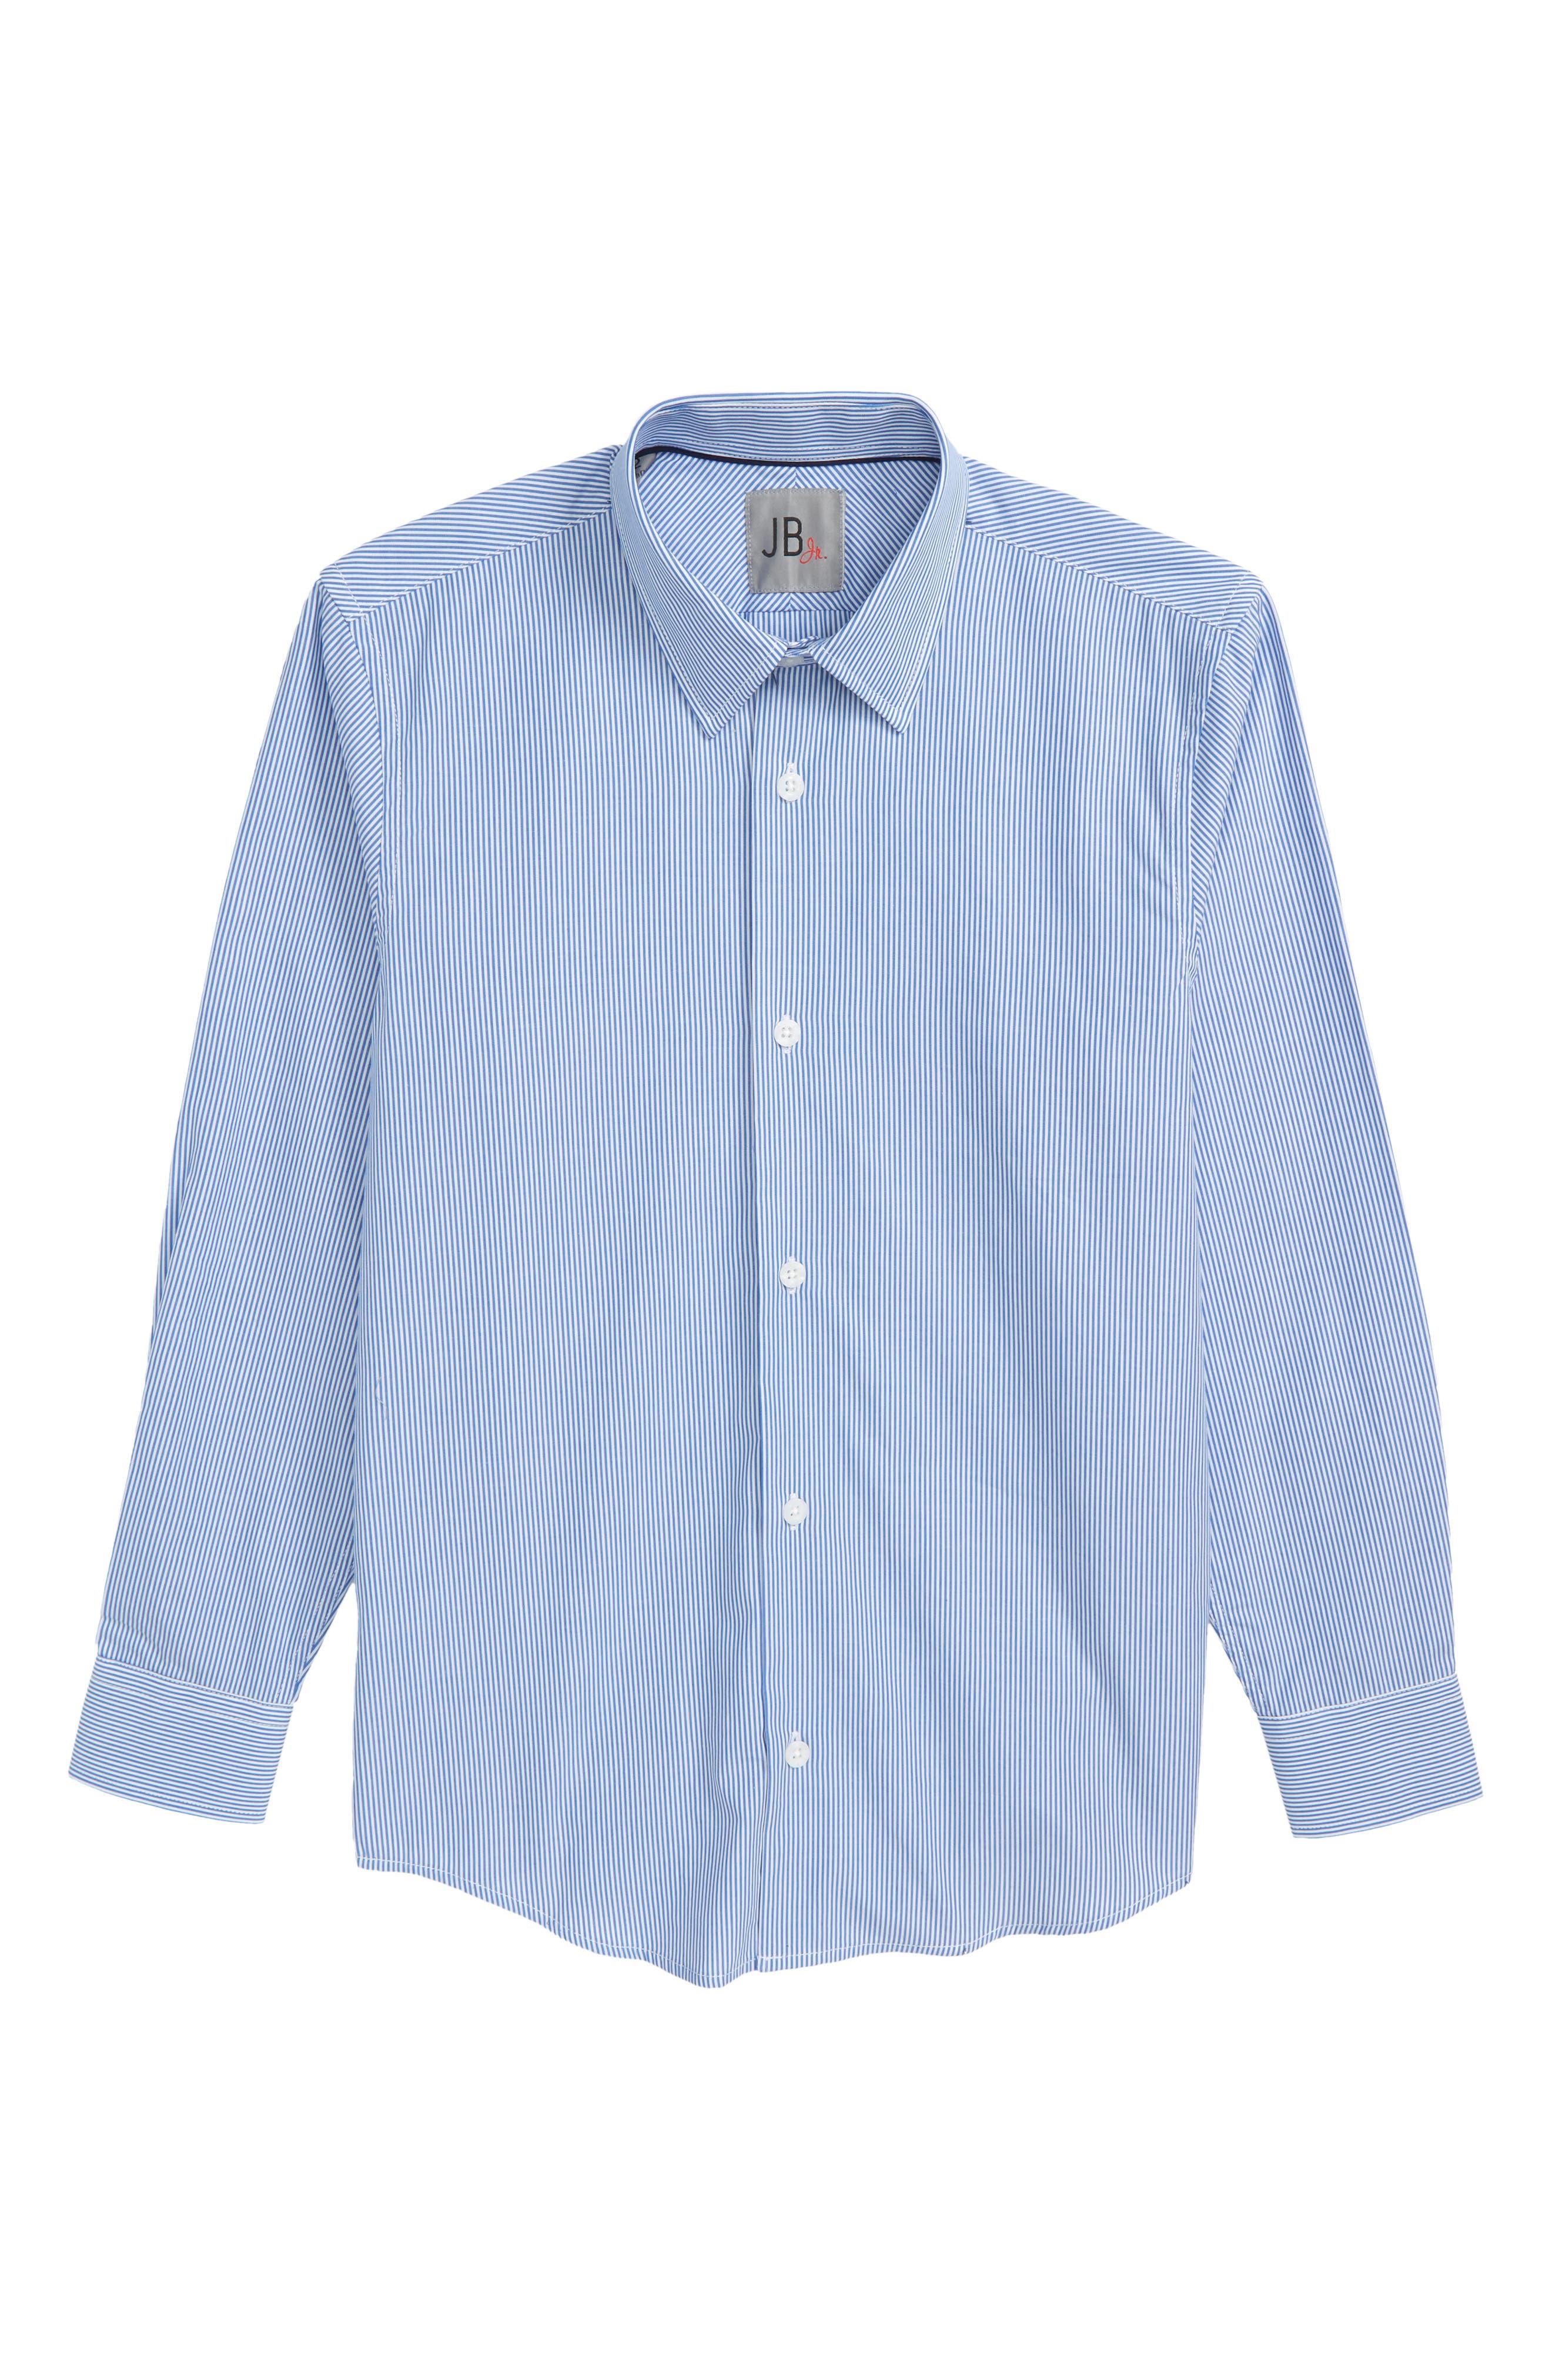 Stripe Dress Shirt,                             Main thumbnail 1, color,                             Blue Stripe